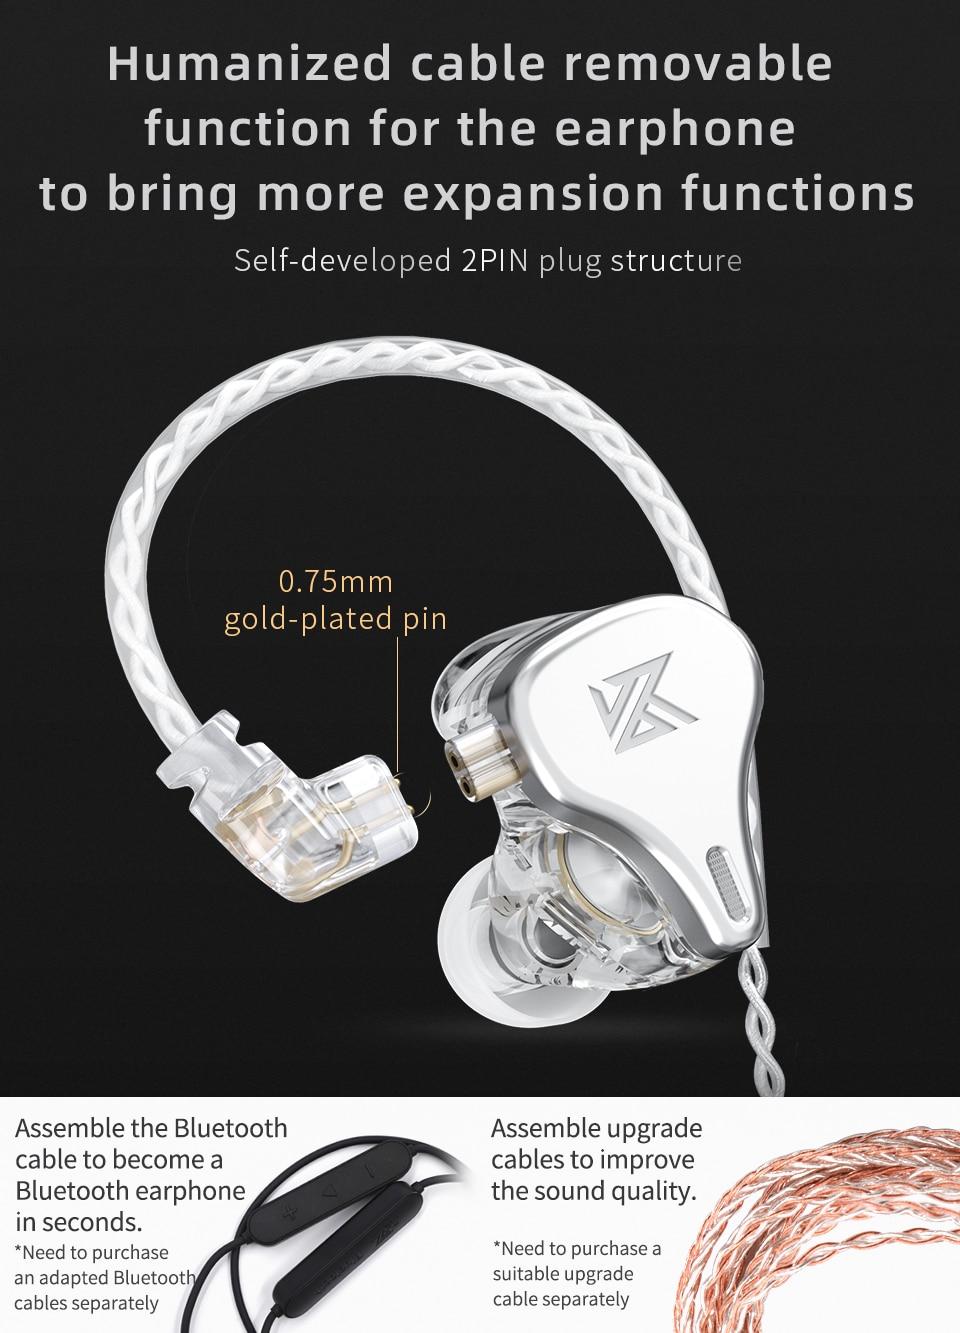 Kz earphone kz dq6 3dd bass hifi earbuds in-ear monitor noise cancelling music sport earphones kz zsx zs10 pro asx edx zsn pro x